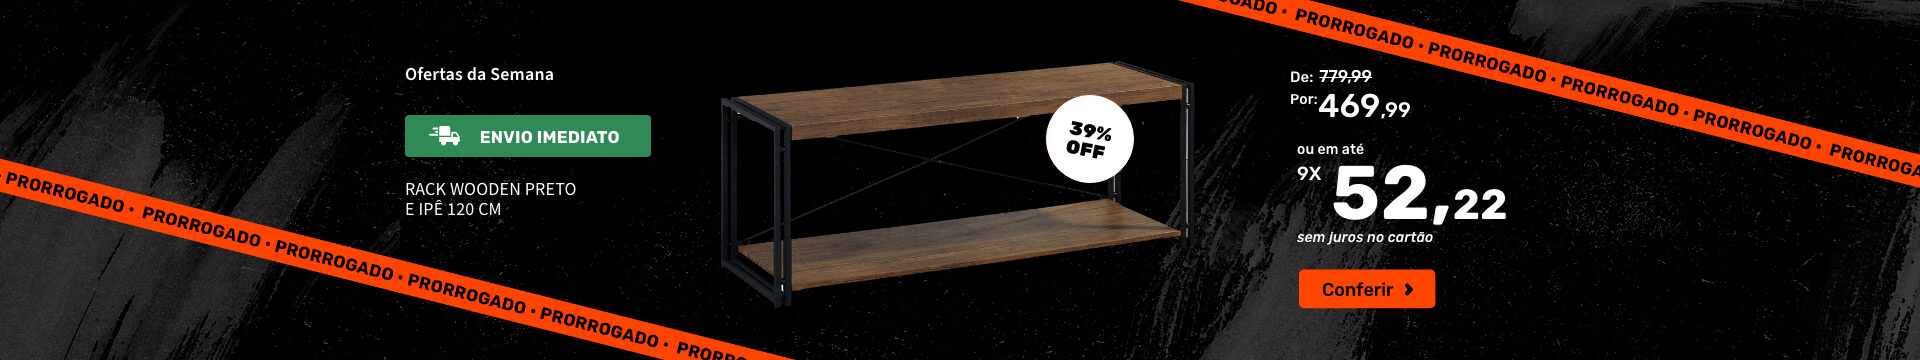 Rack Wooden Preto e Ipê 120 cm